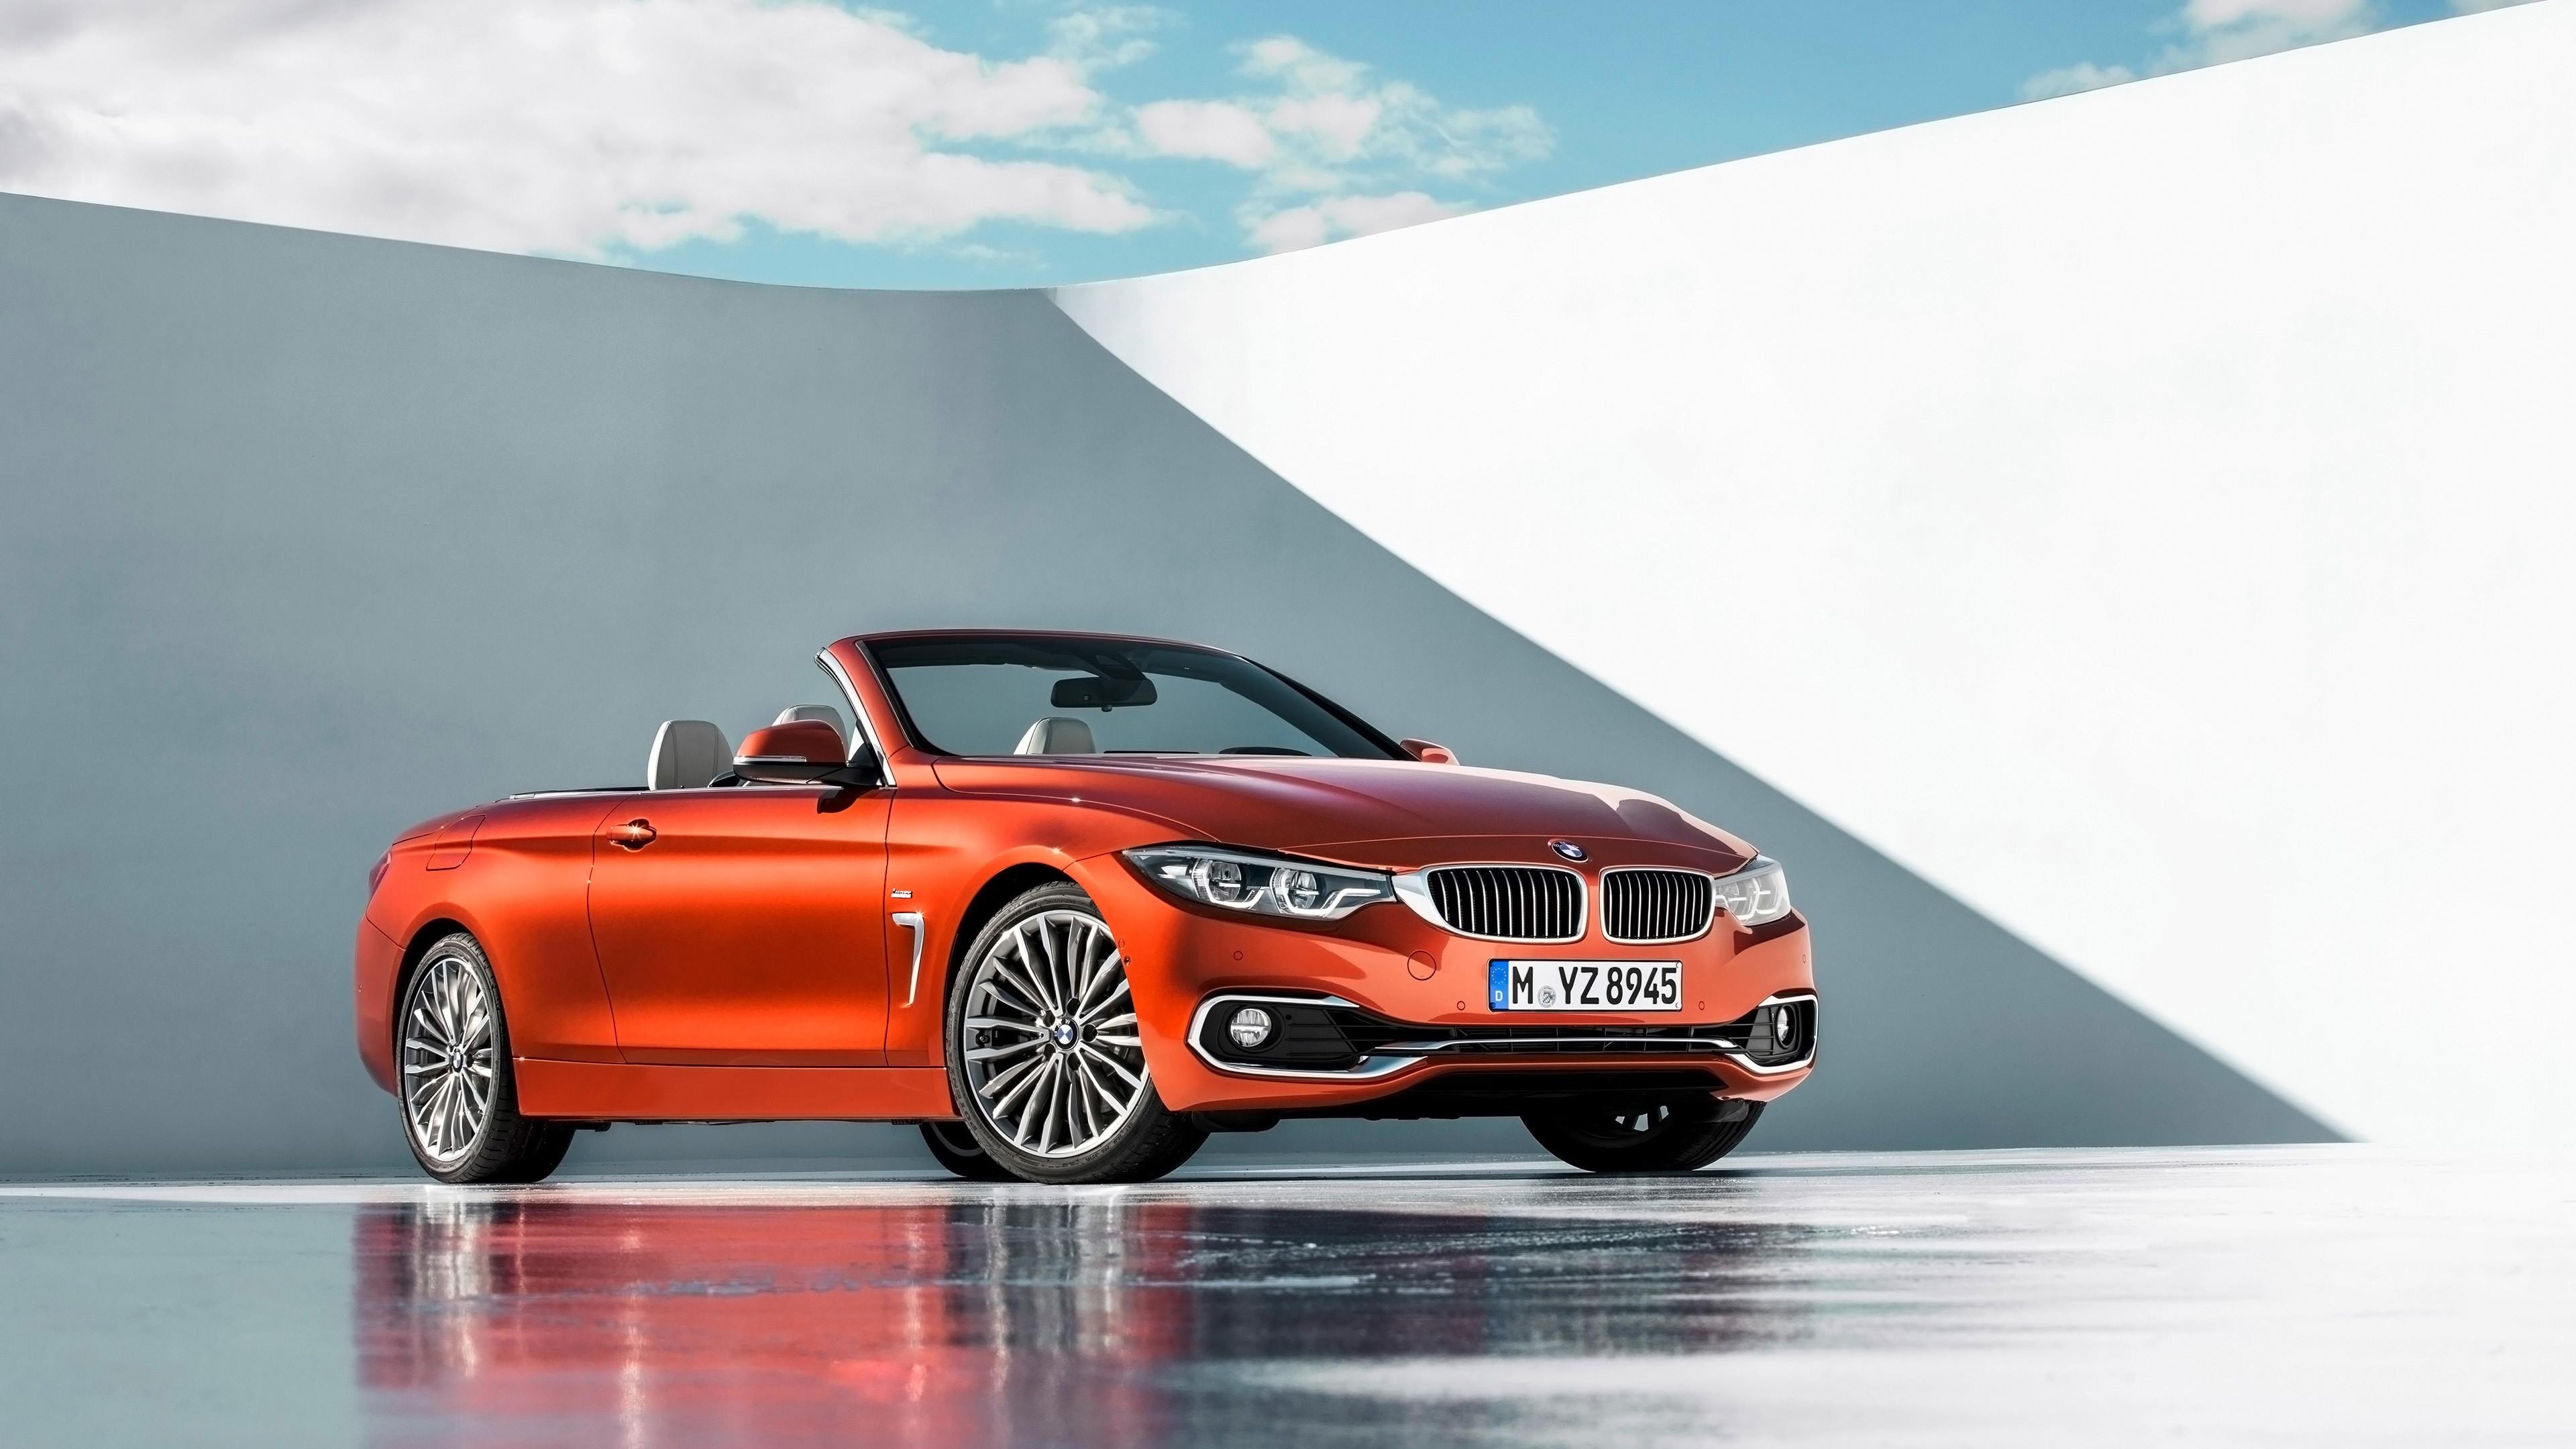 2018 BMW 4 Series Luxury Convertible 4K Wallpaper | HD Car ...